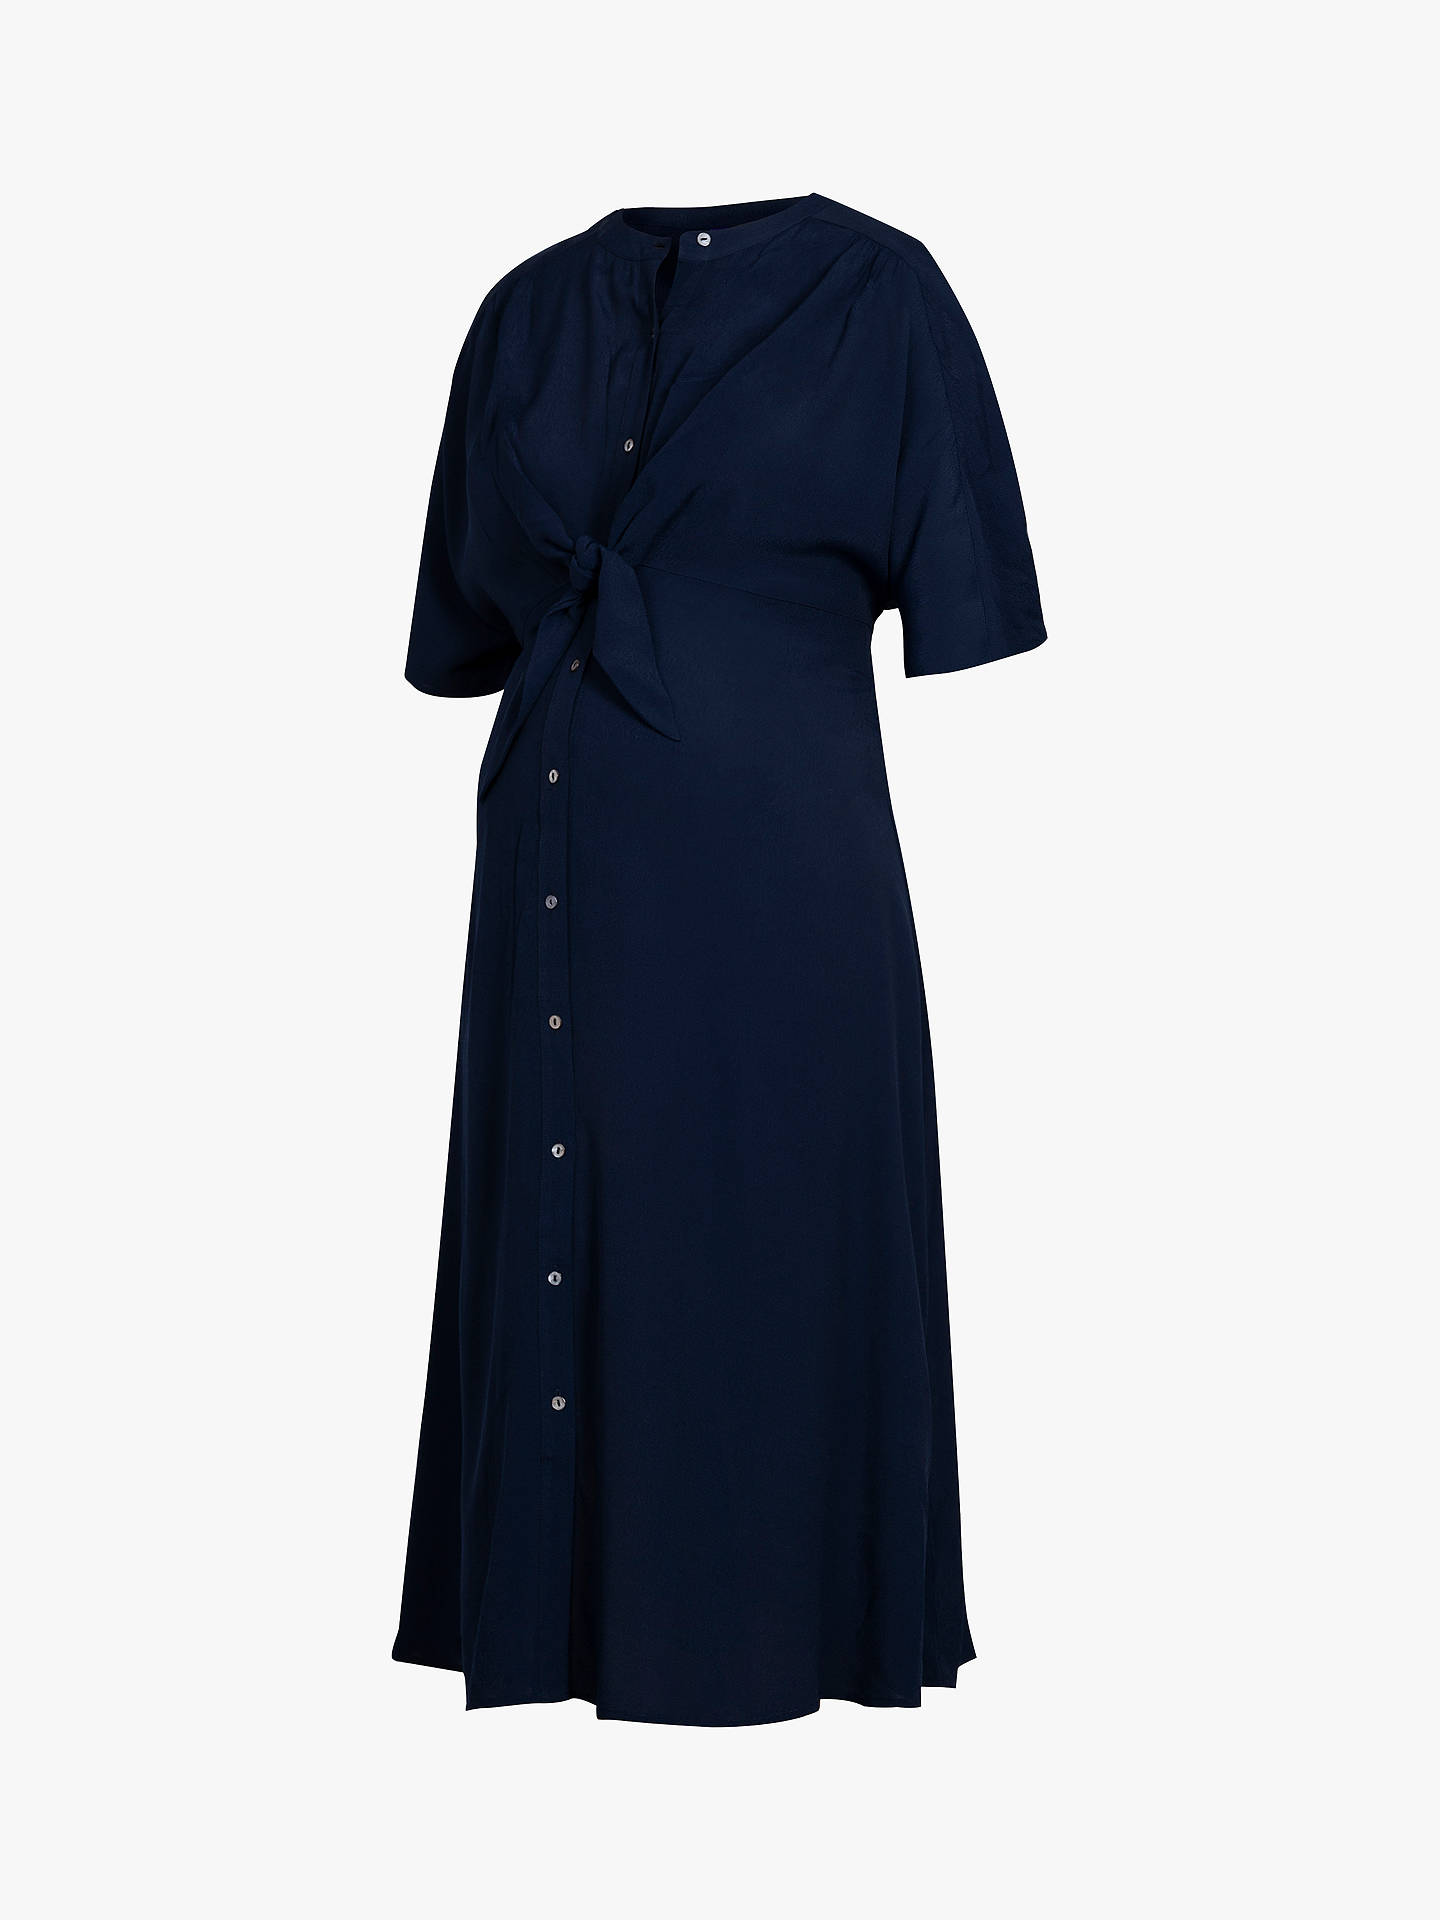 207b56ff ... Buy Séraphine Bitzy Shirt Maternity Dress, Navy, 8 Online at  johnlewis.com